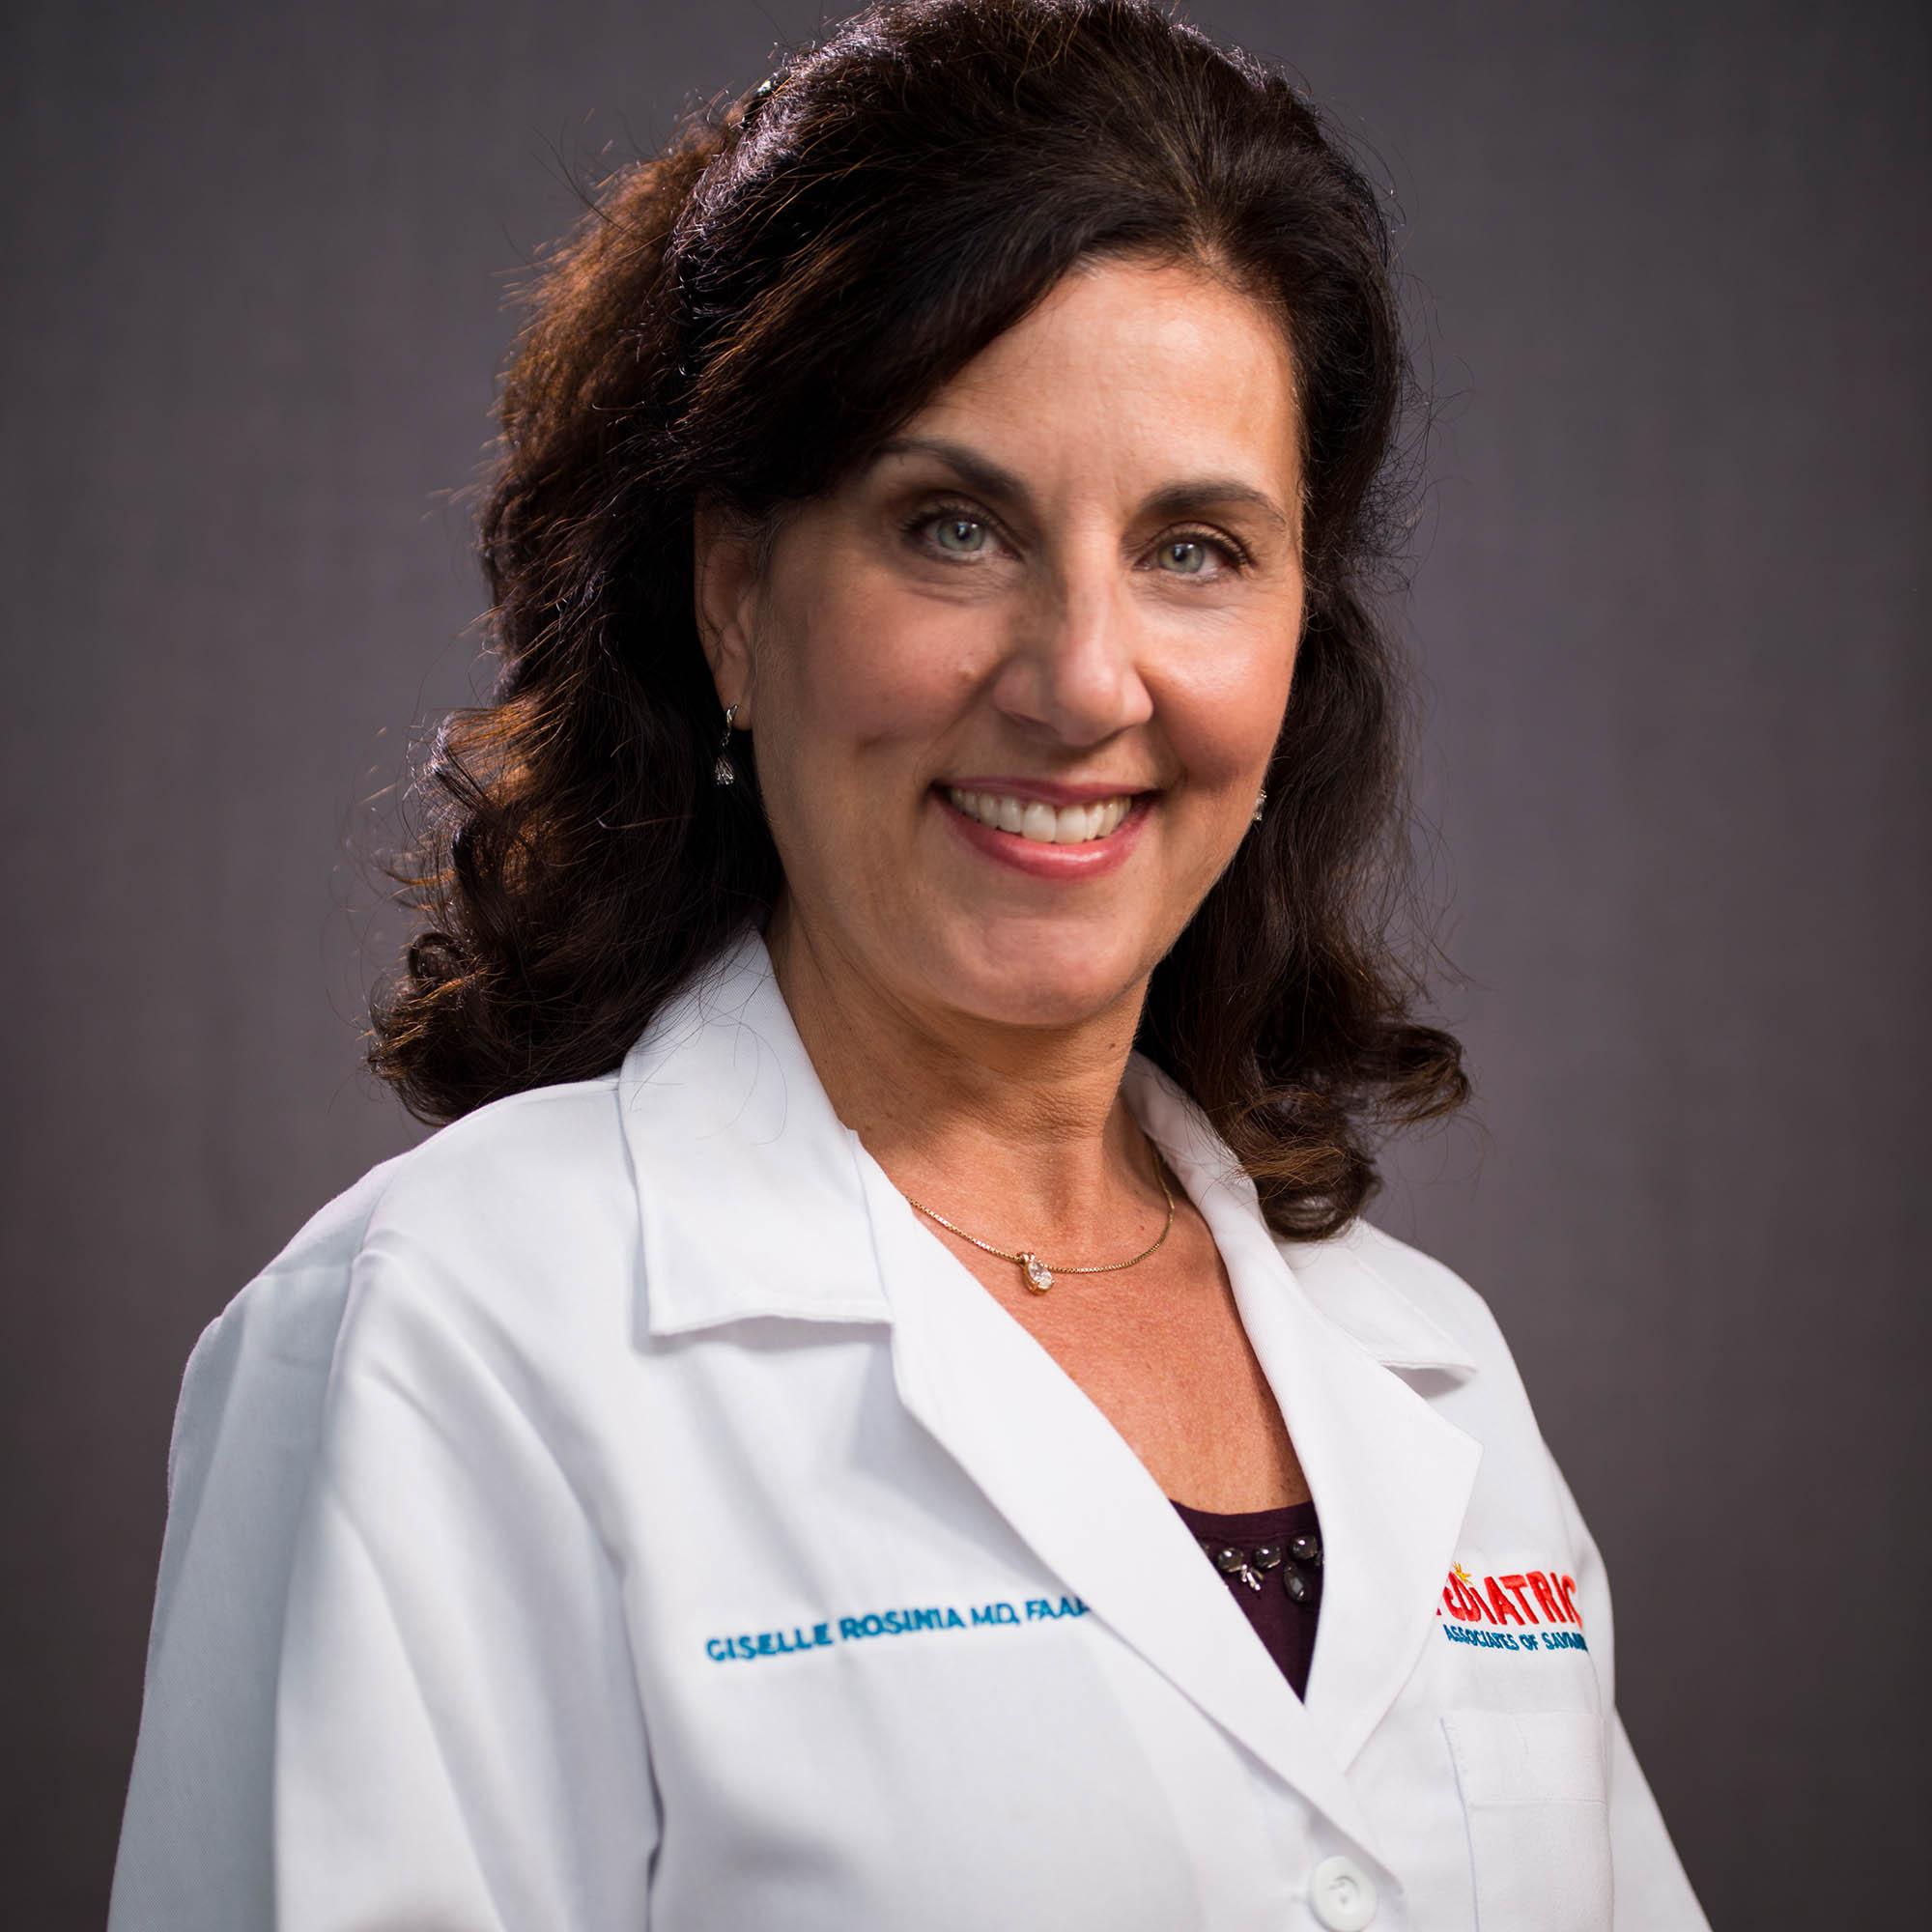 Dr. Giselle M. Rosinia